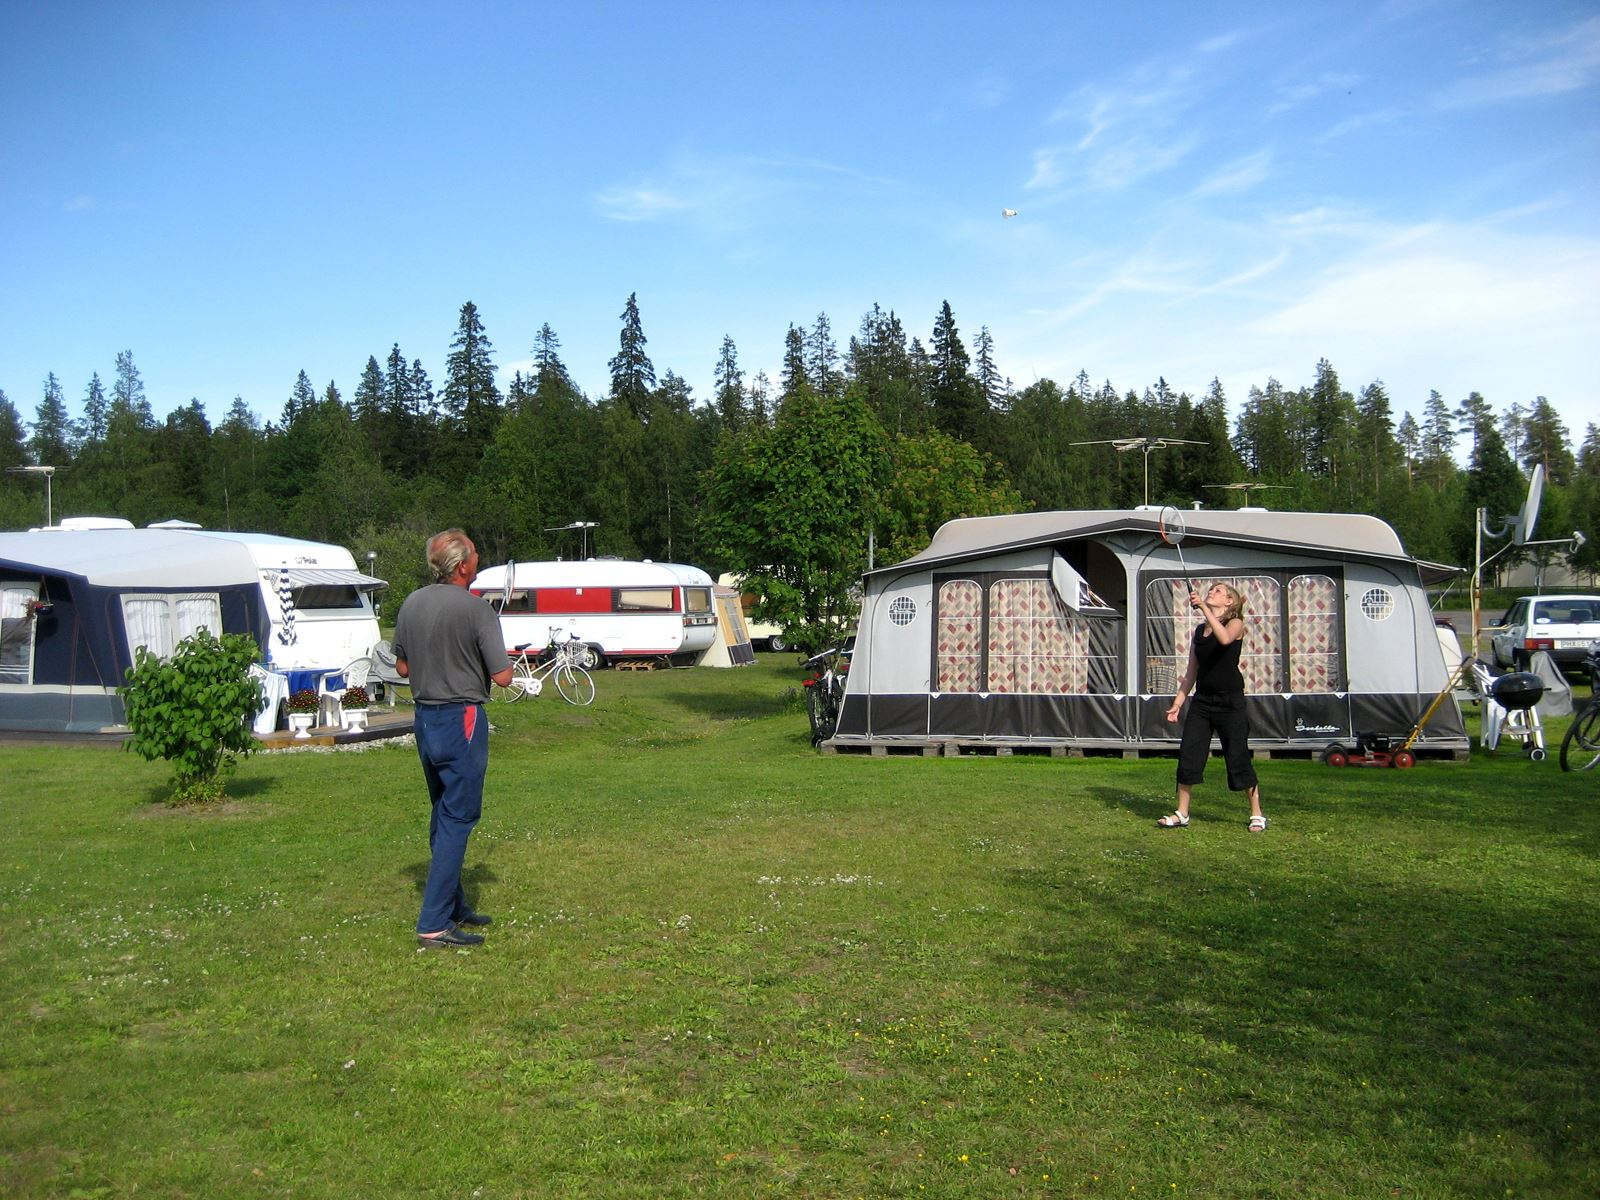 First Camp Umeå/Camping